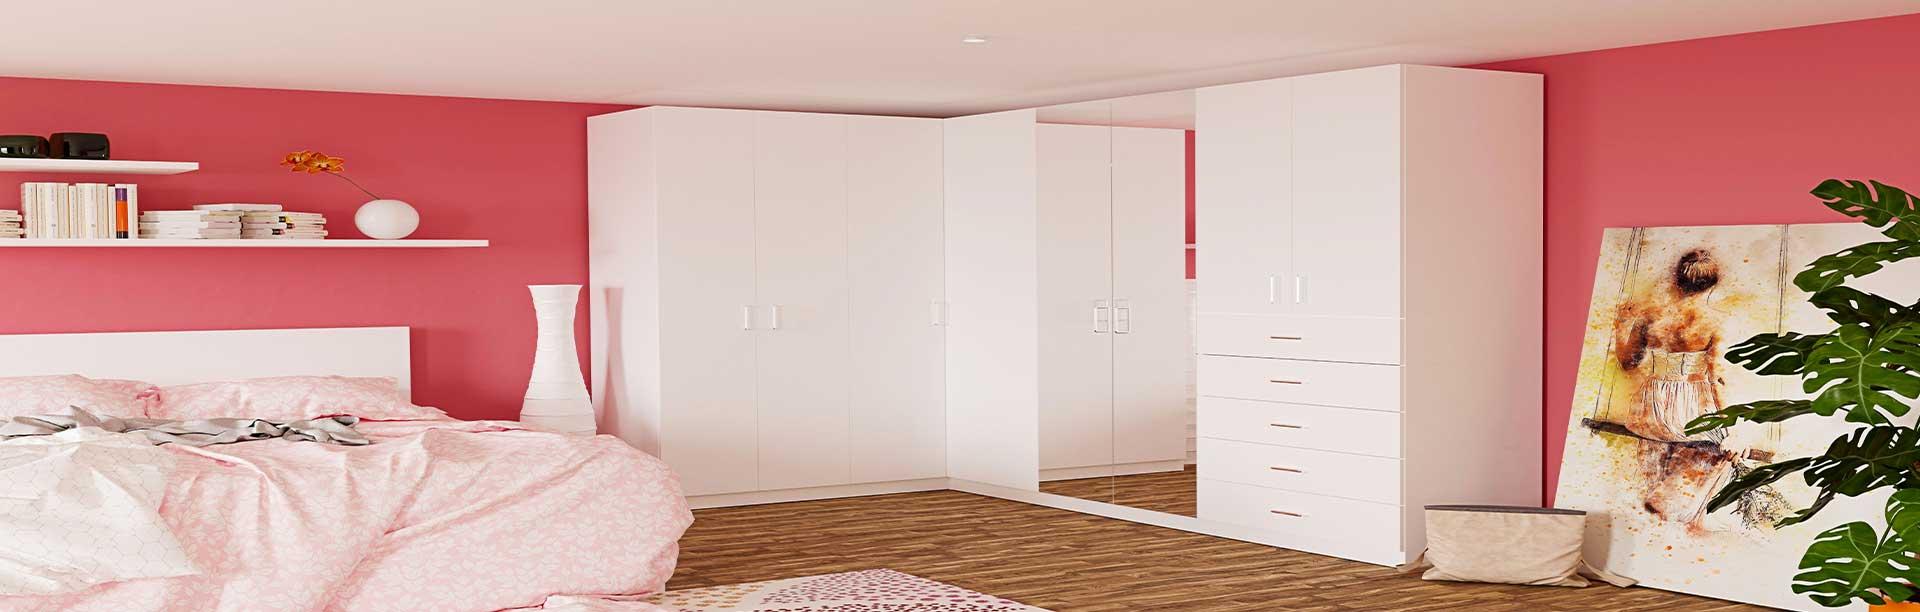 Full Size of Eckkleiderschrank Kinderzimmer Regal Weiß Sofa Regale Kinderzimmer Eckkleiderschrank Kinderzimmer